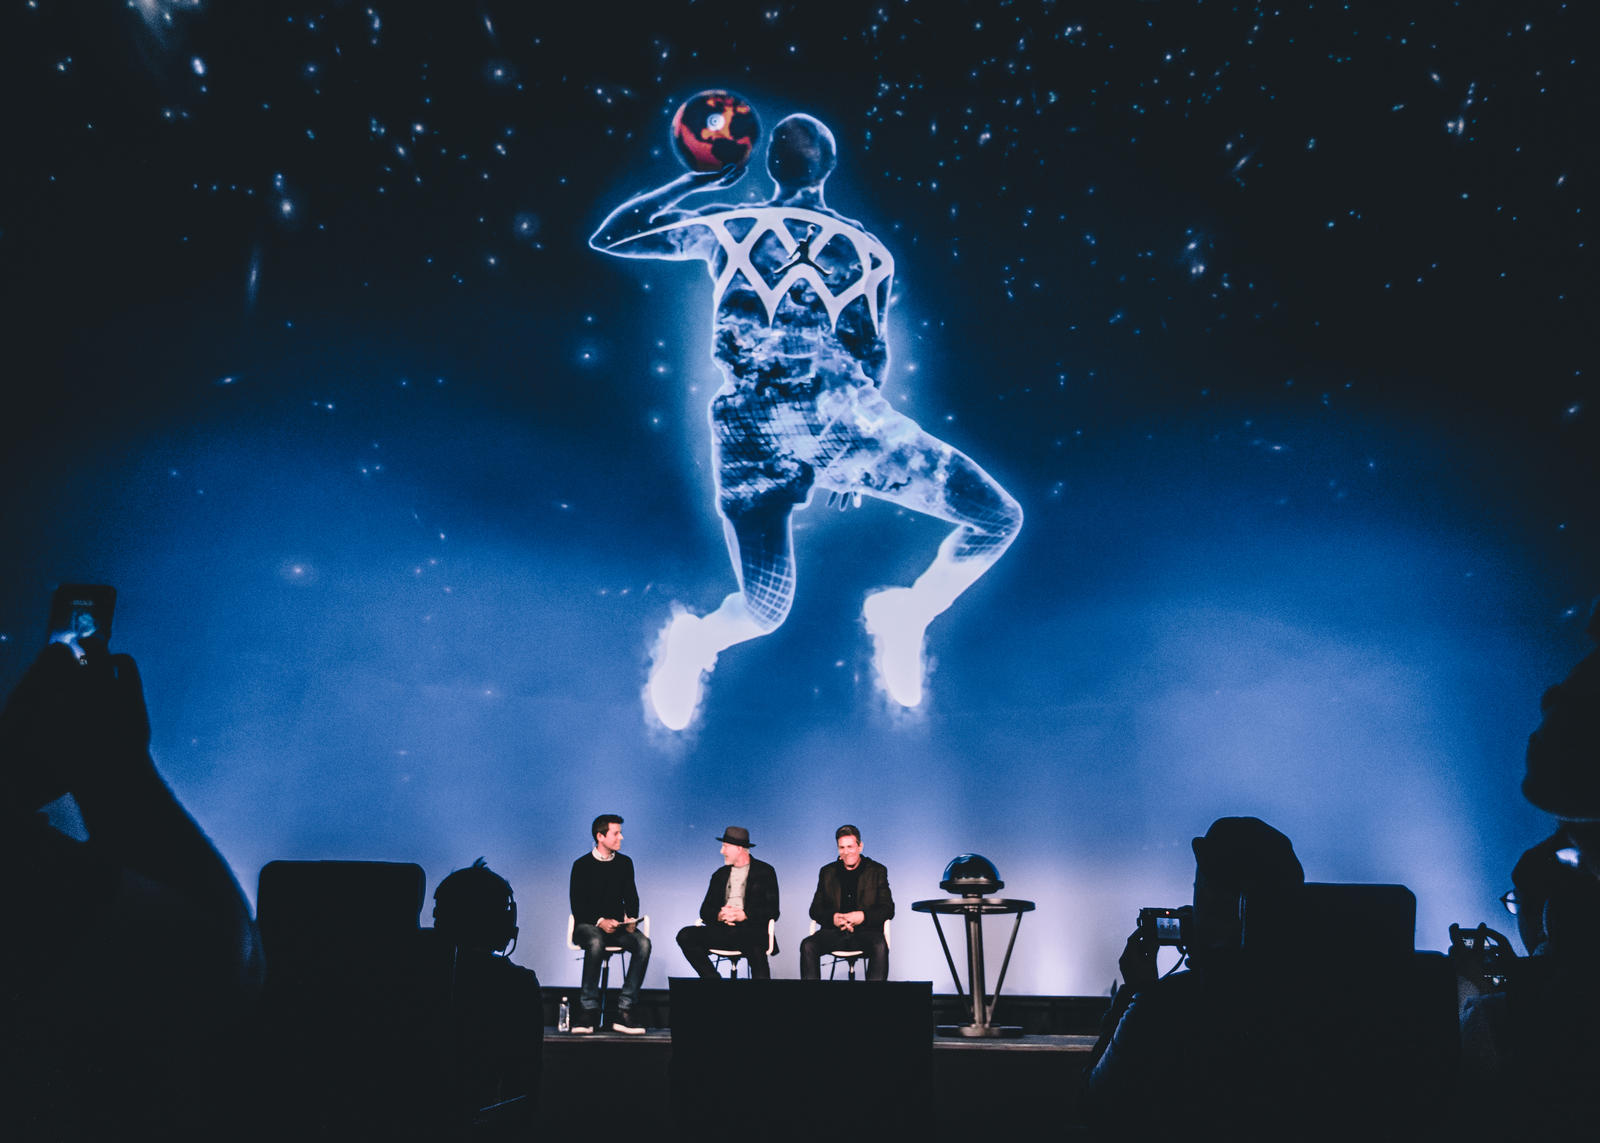 Air Jordan XXX unveil event